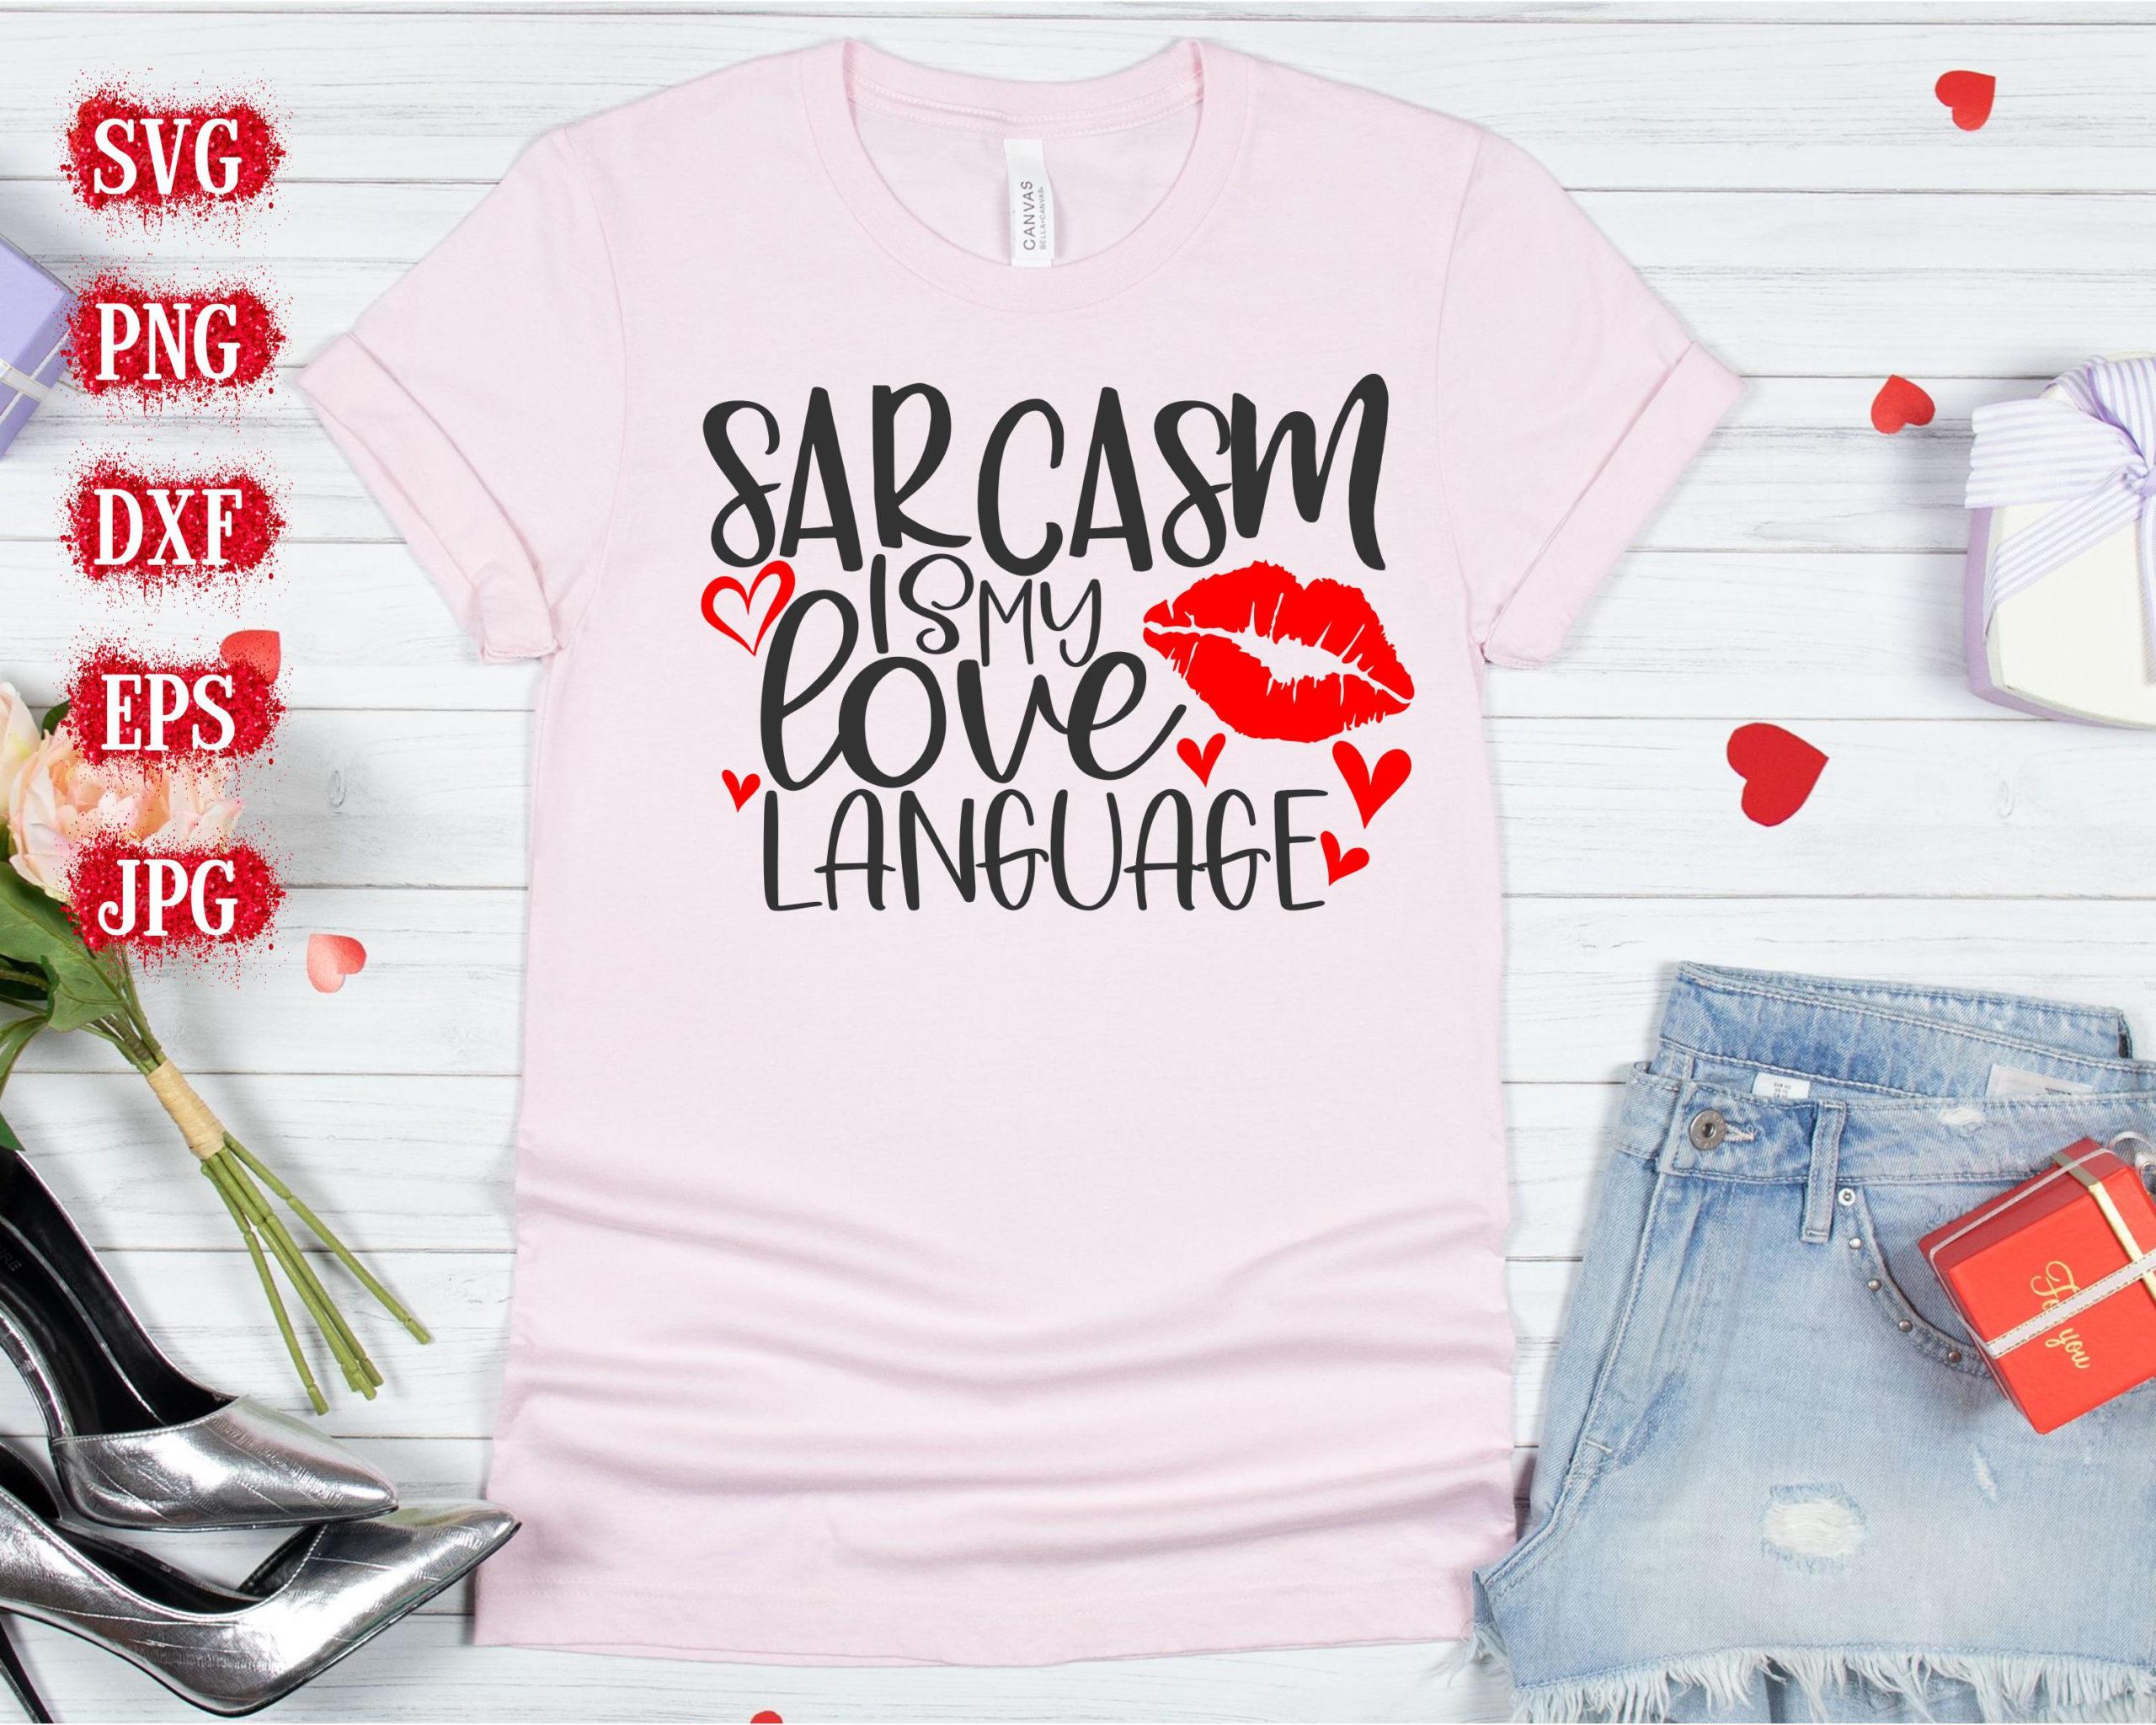 Sarcasm-is-my-love-language-svg-valentines-day-svg-funny-valentines-svg-valentines-svg-designs-valentines-cut-files-cricut-cut-file-600a056a